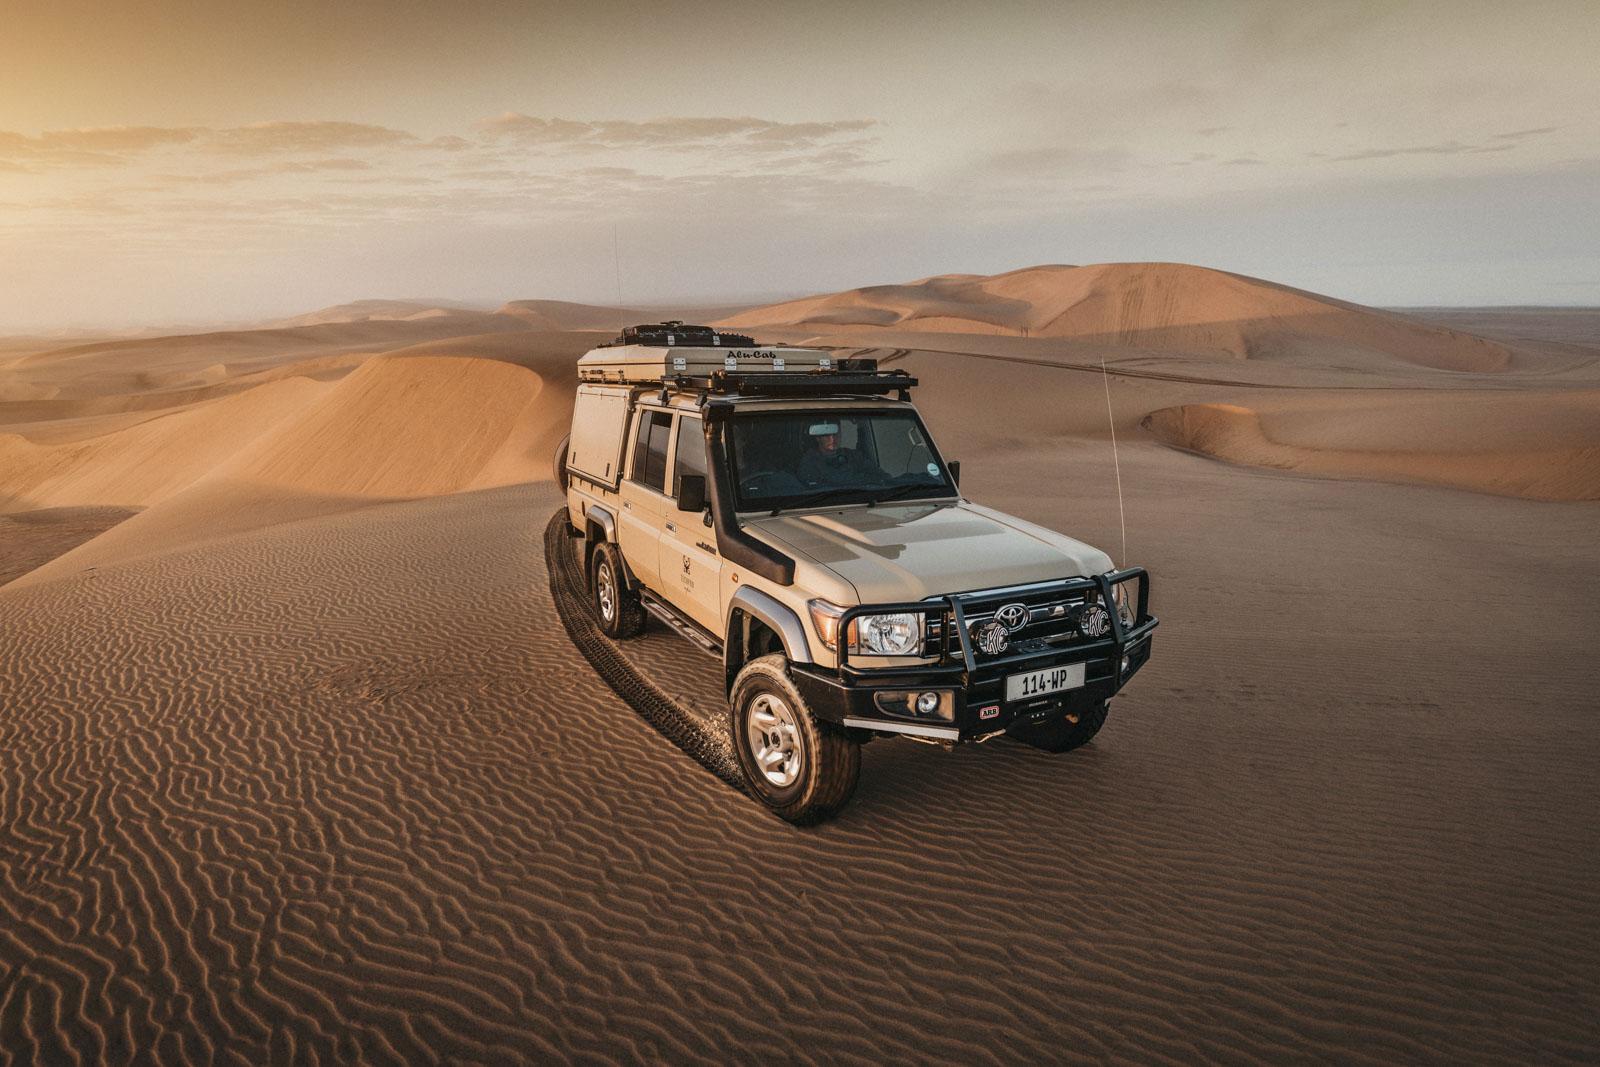 DNA Photographers Tech Pro Safari Namibia 2018 0006-2.jpg